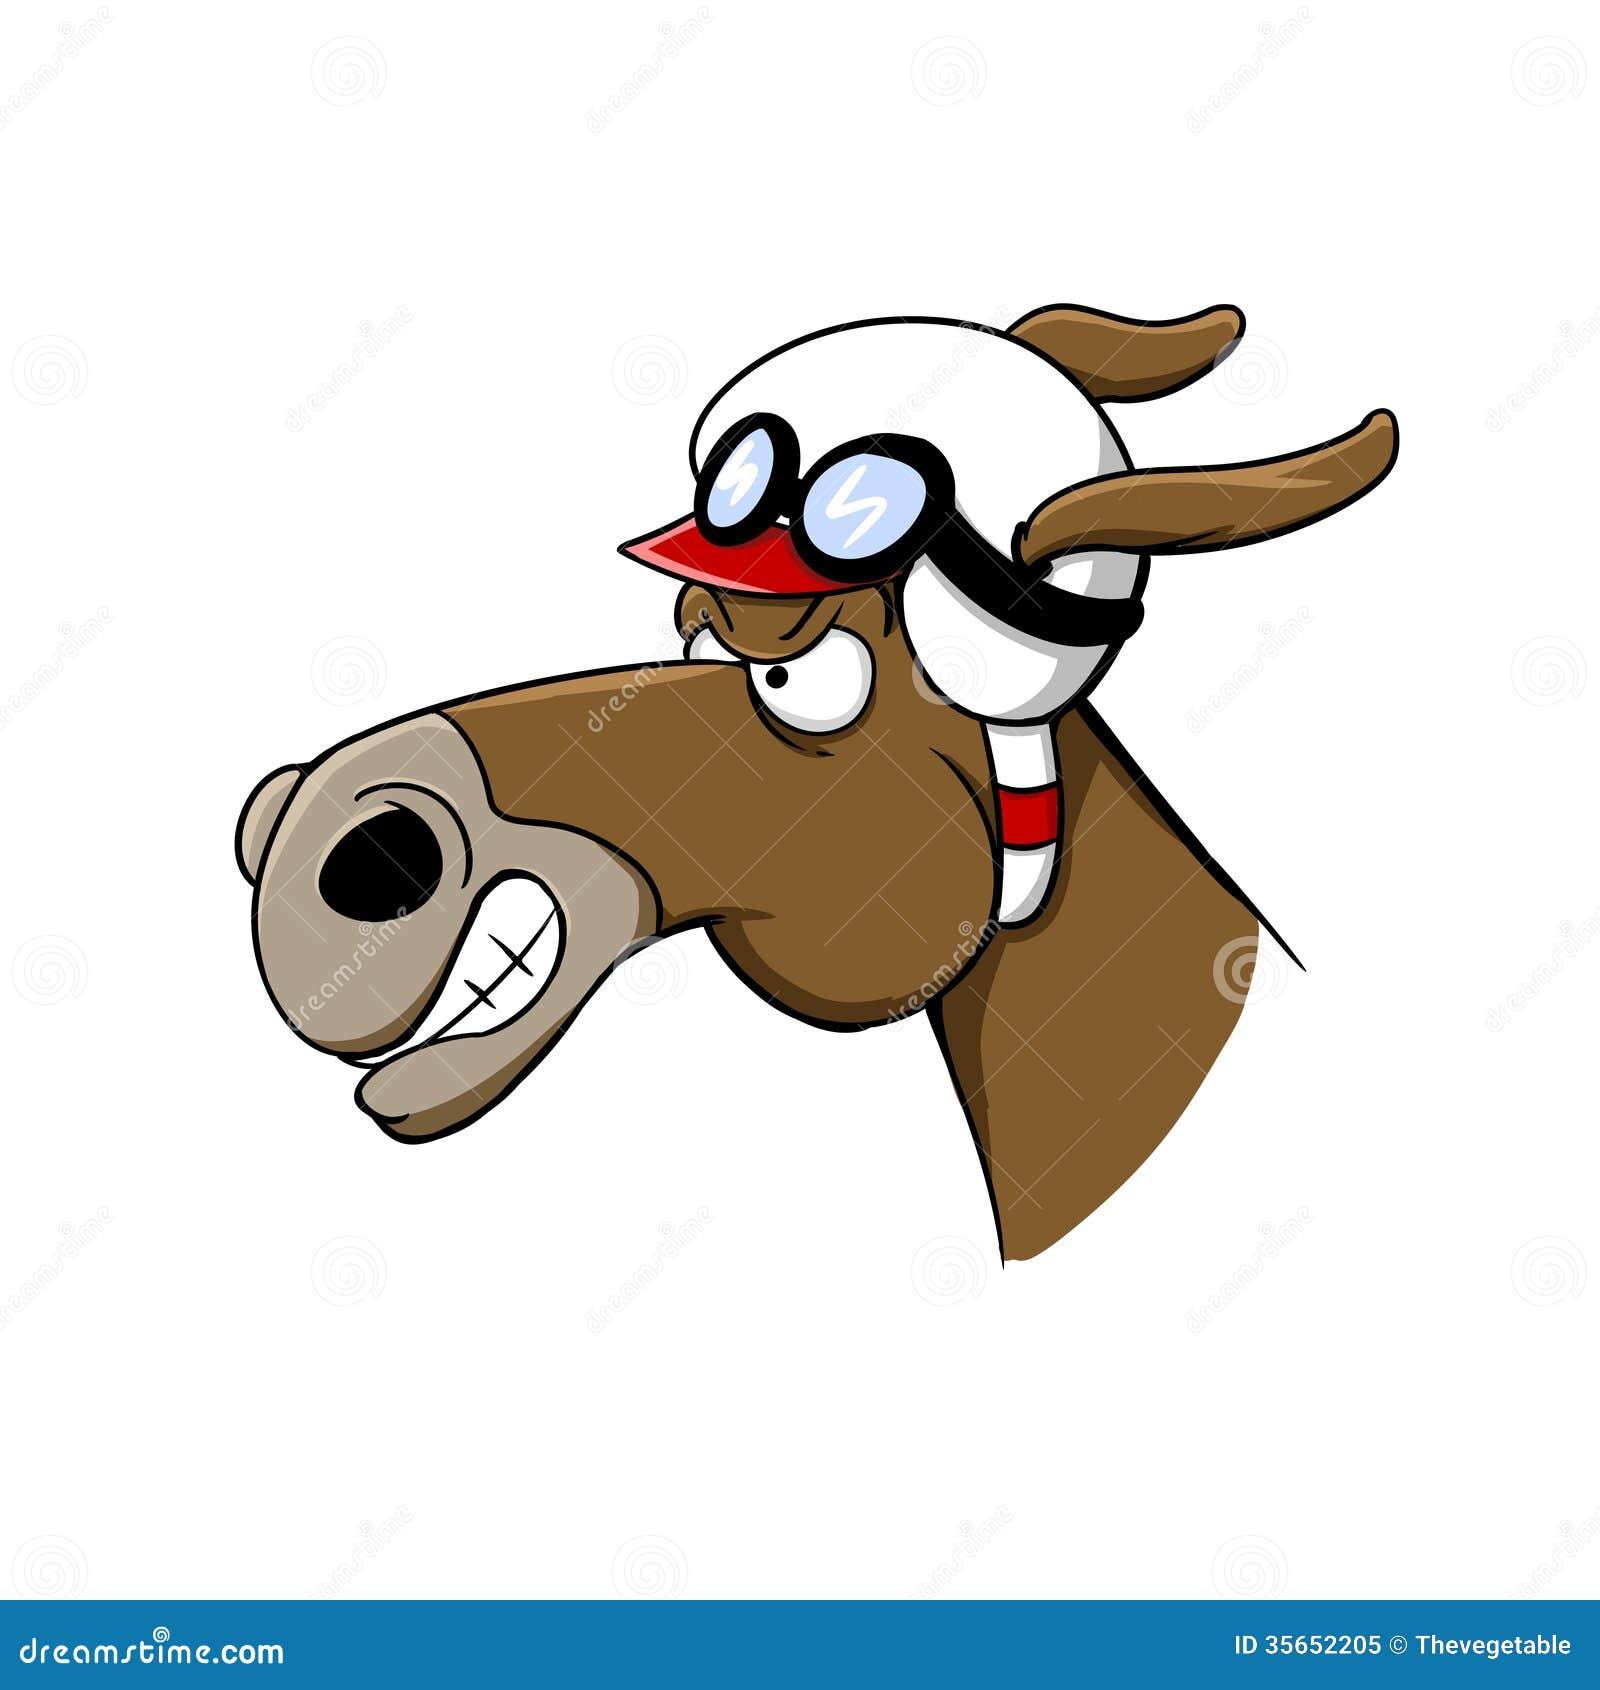 Horse Racing Royalty Free Stock Photo Image 35652205